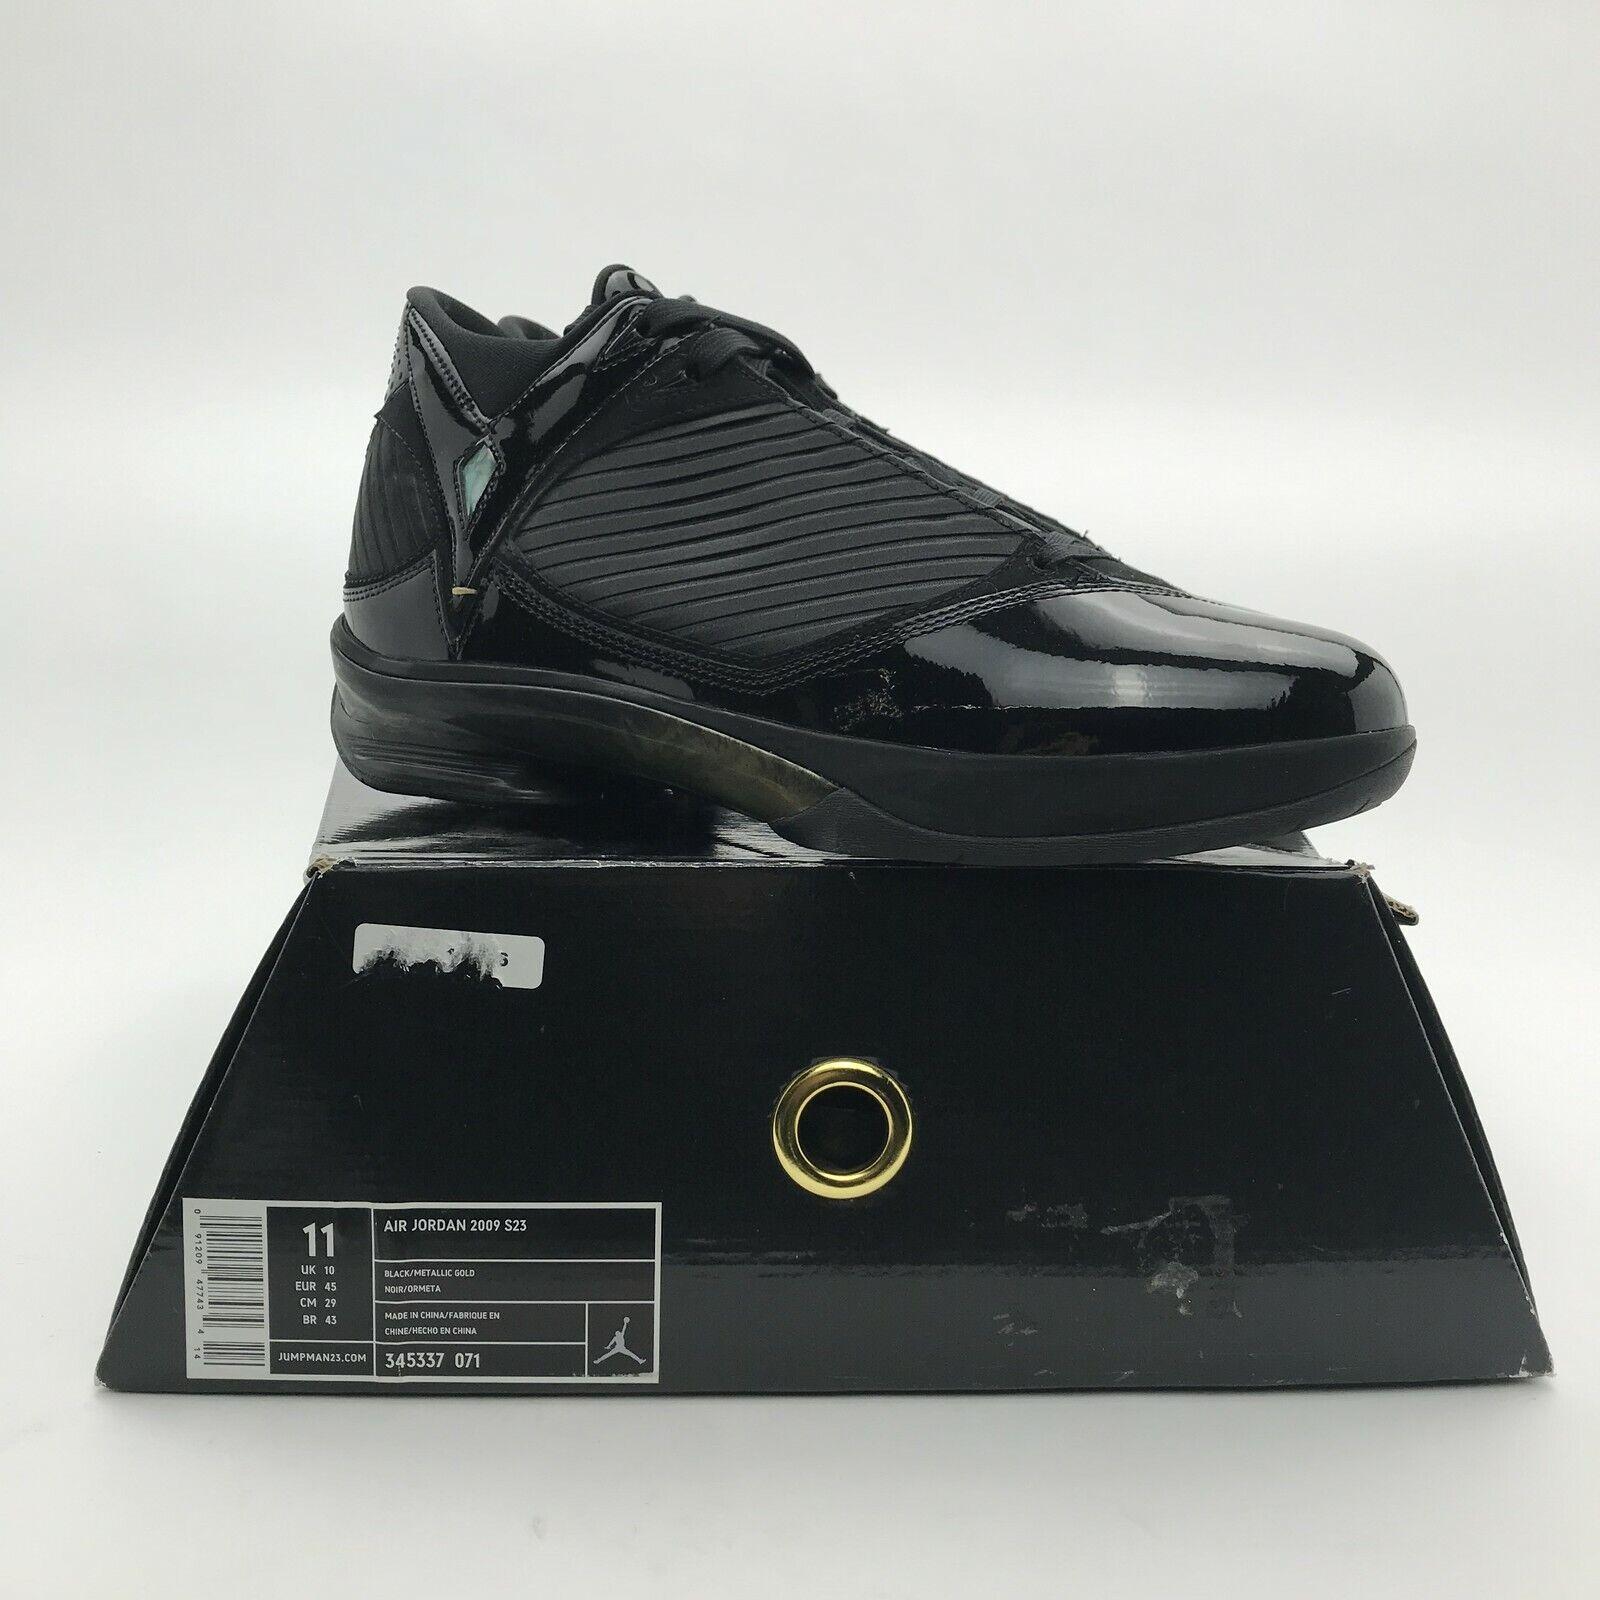 2009 Nike Air Jordan S23 Retro OG Black Metallic gold 345377-071 NEW Men US 11